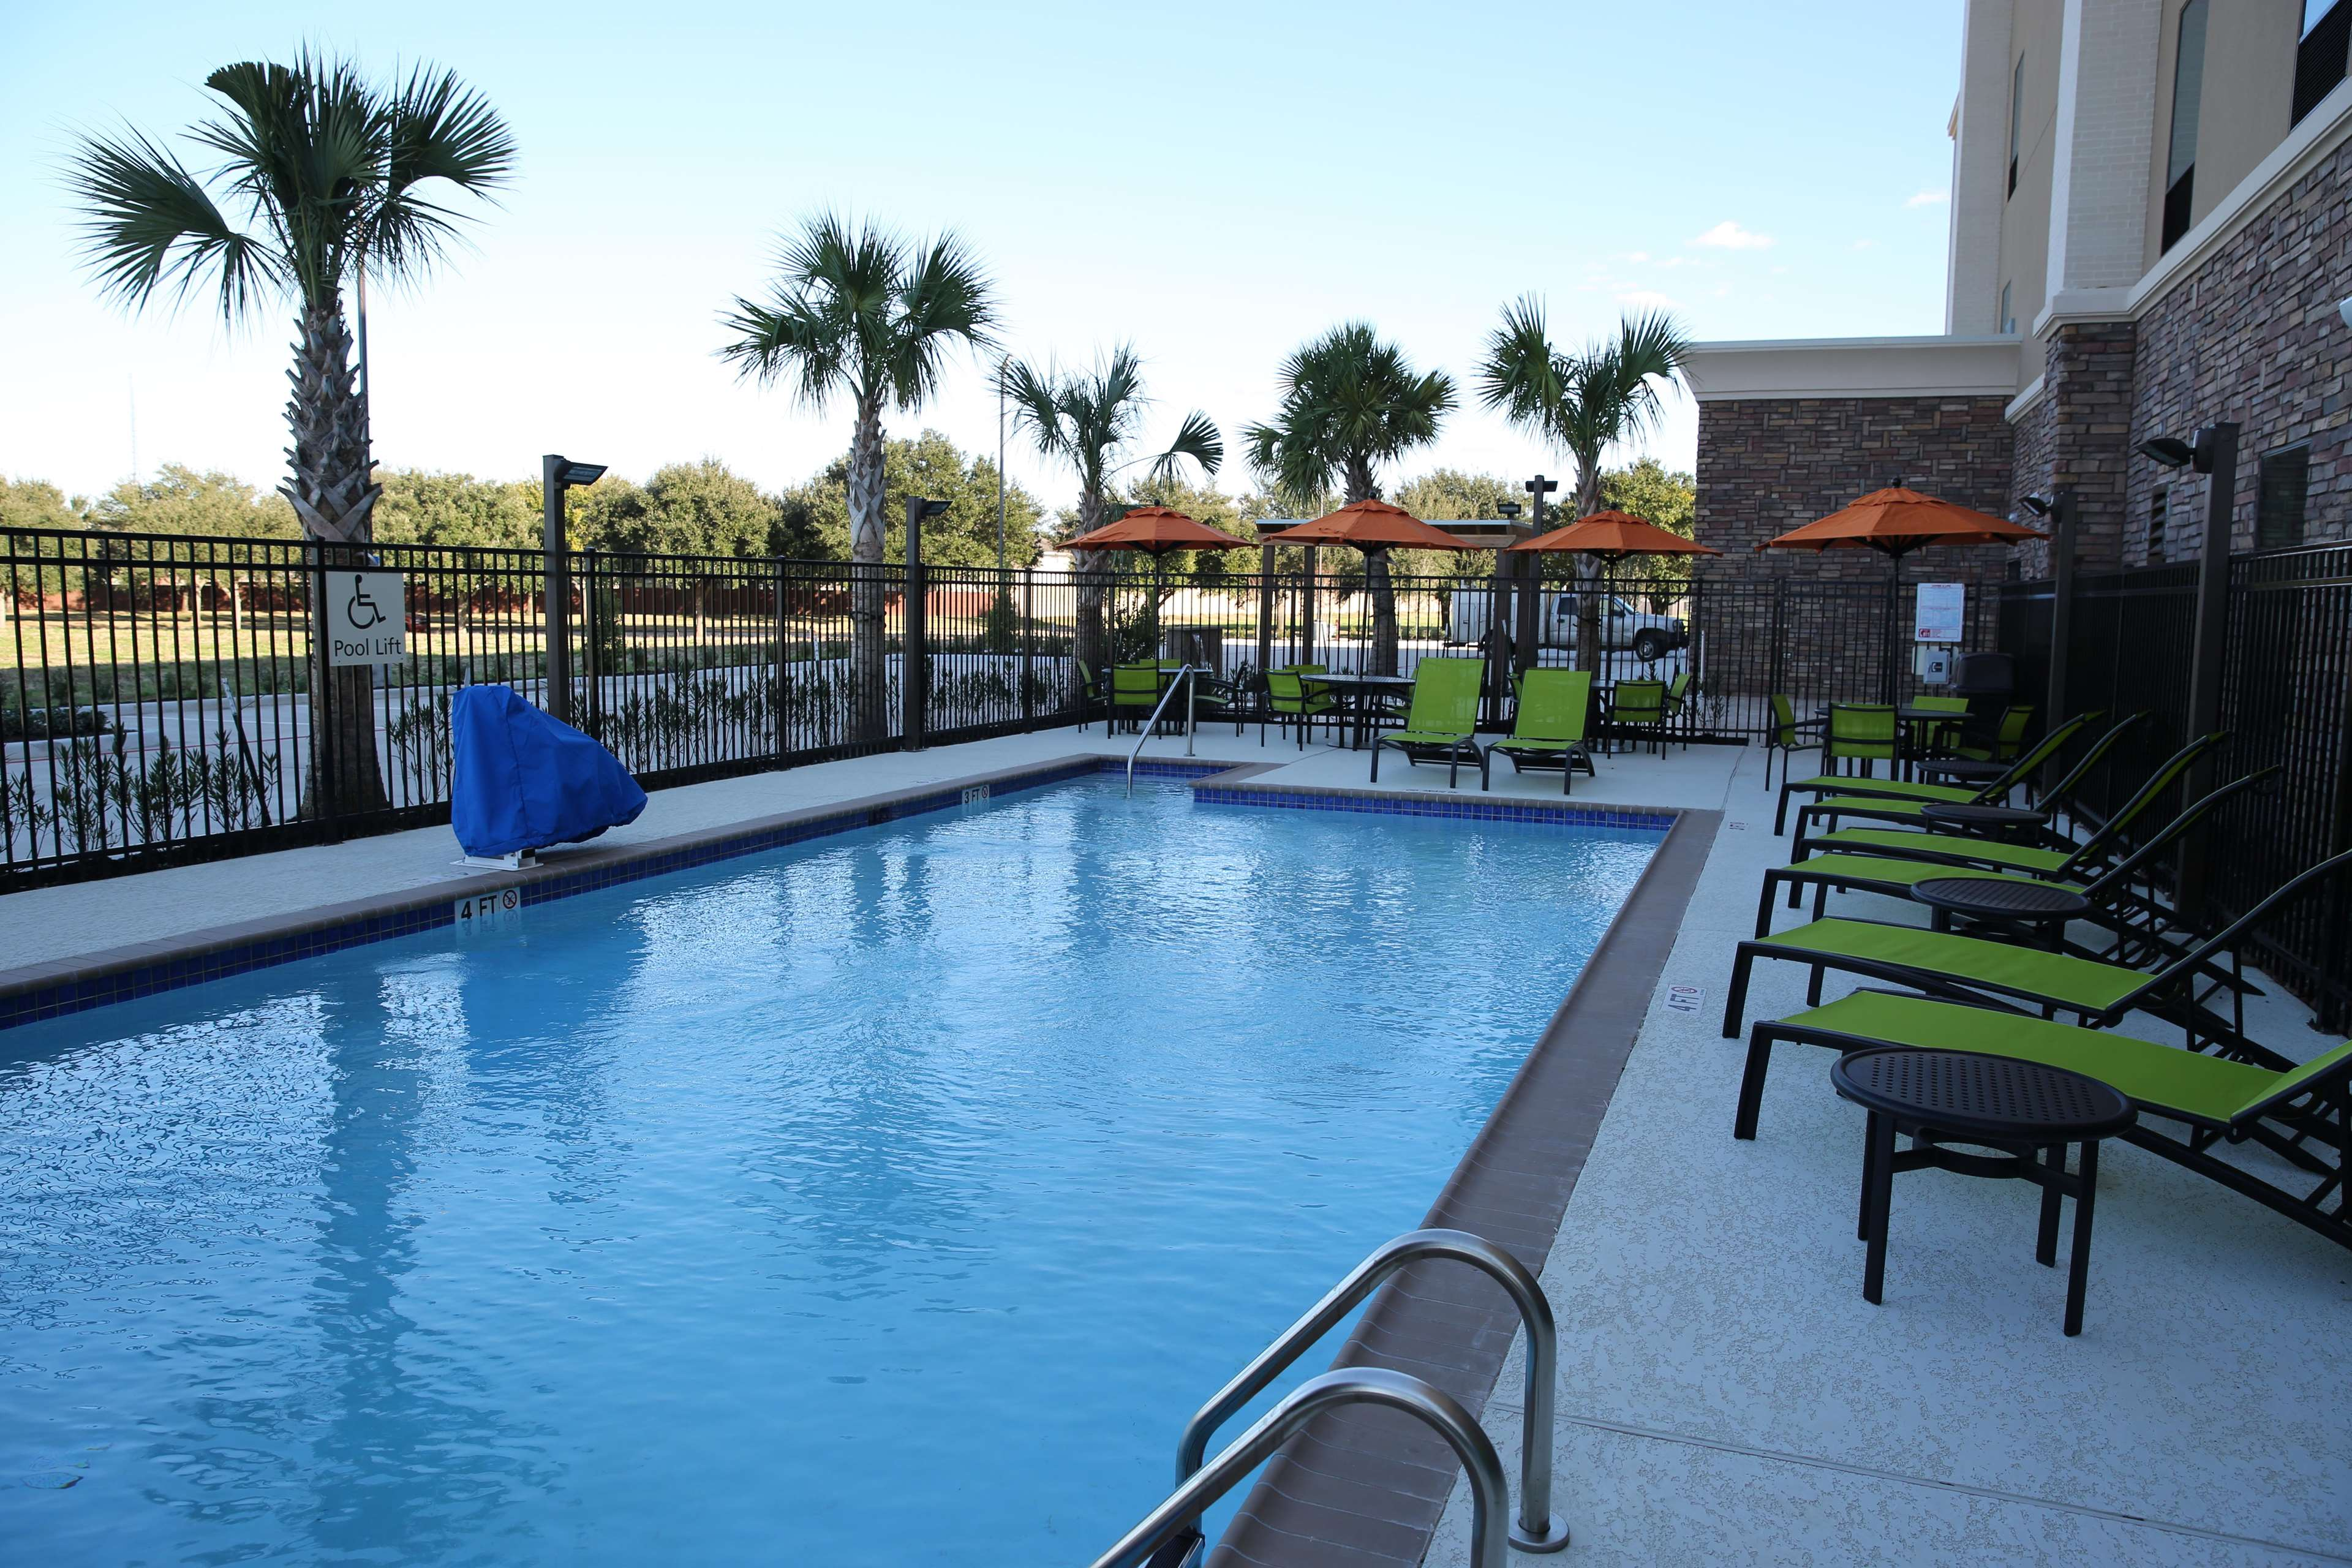 Hampton Inn & Suites Missouri City, TX image 15